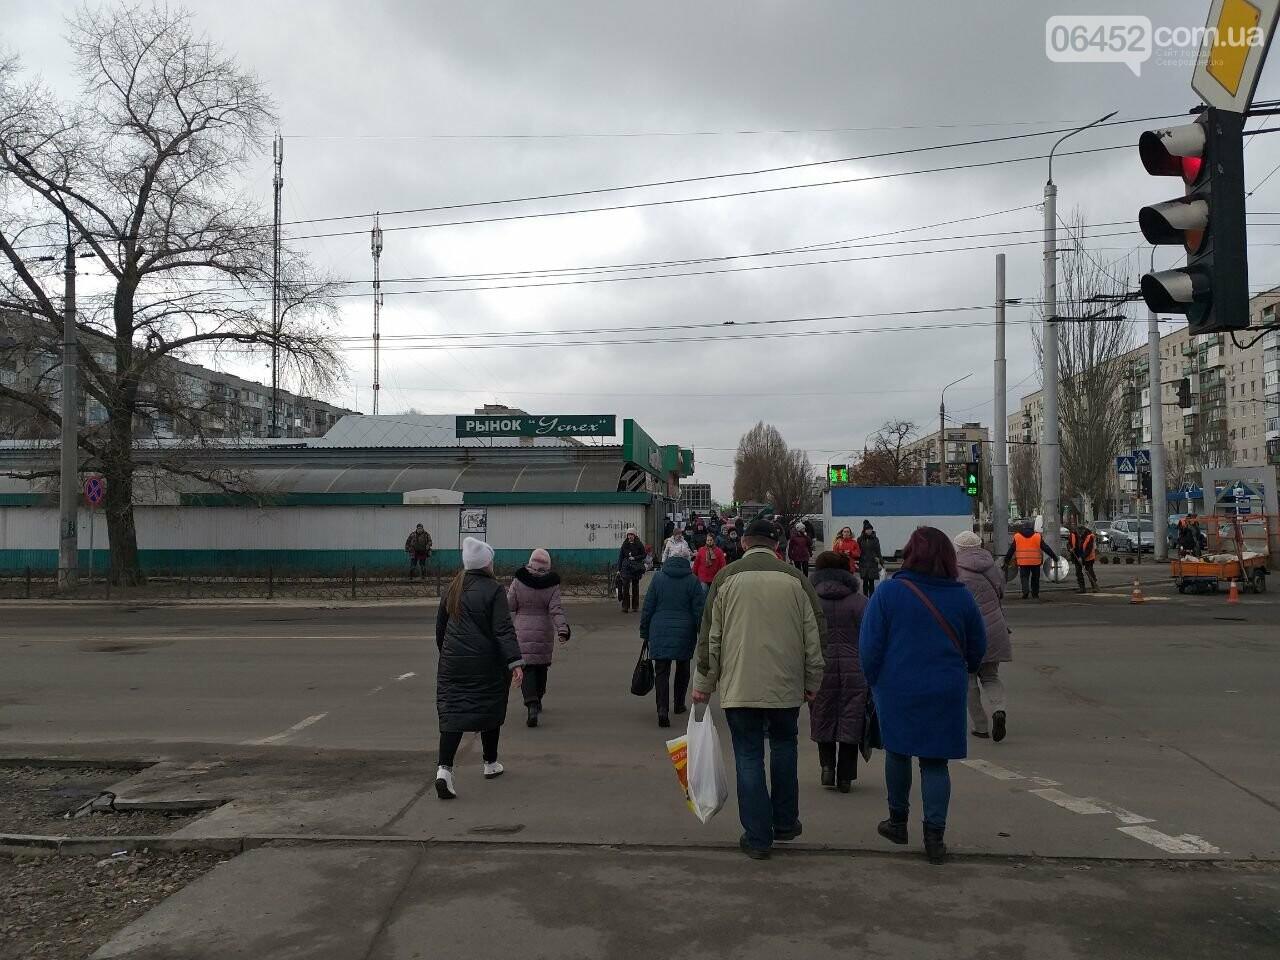 Северодончанам на заметку: какие штрафы ждут пешеходов за нарушение ПДД, фото-1